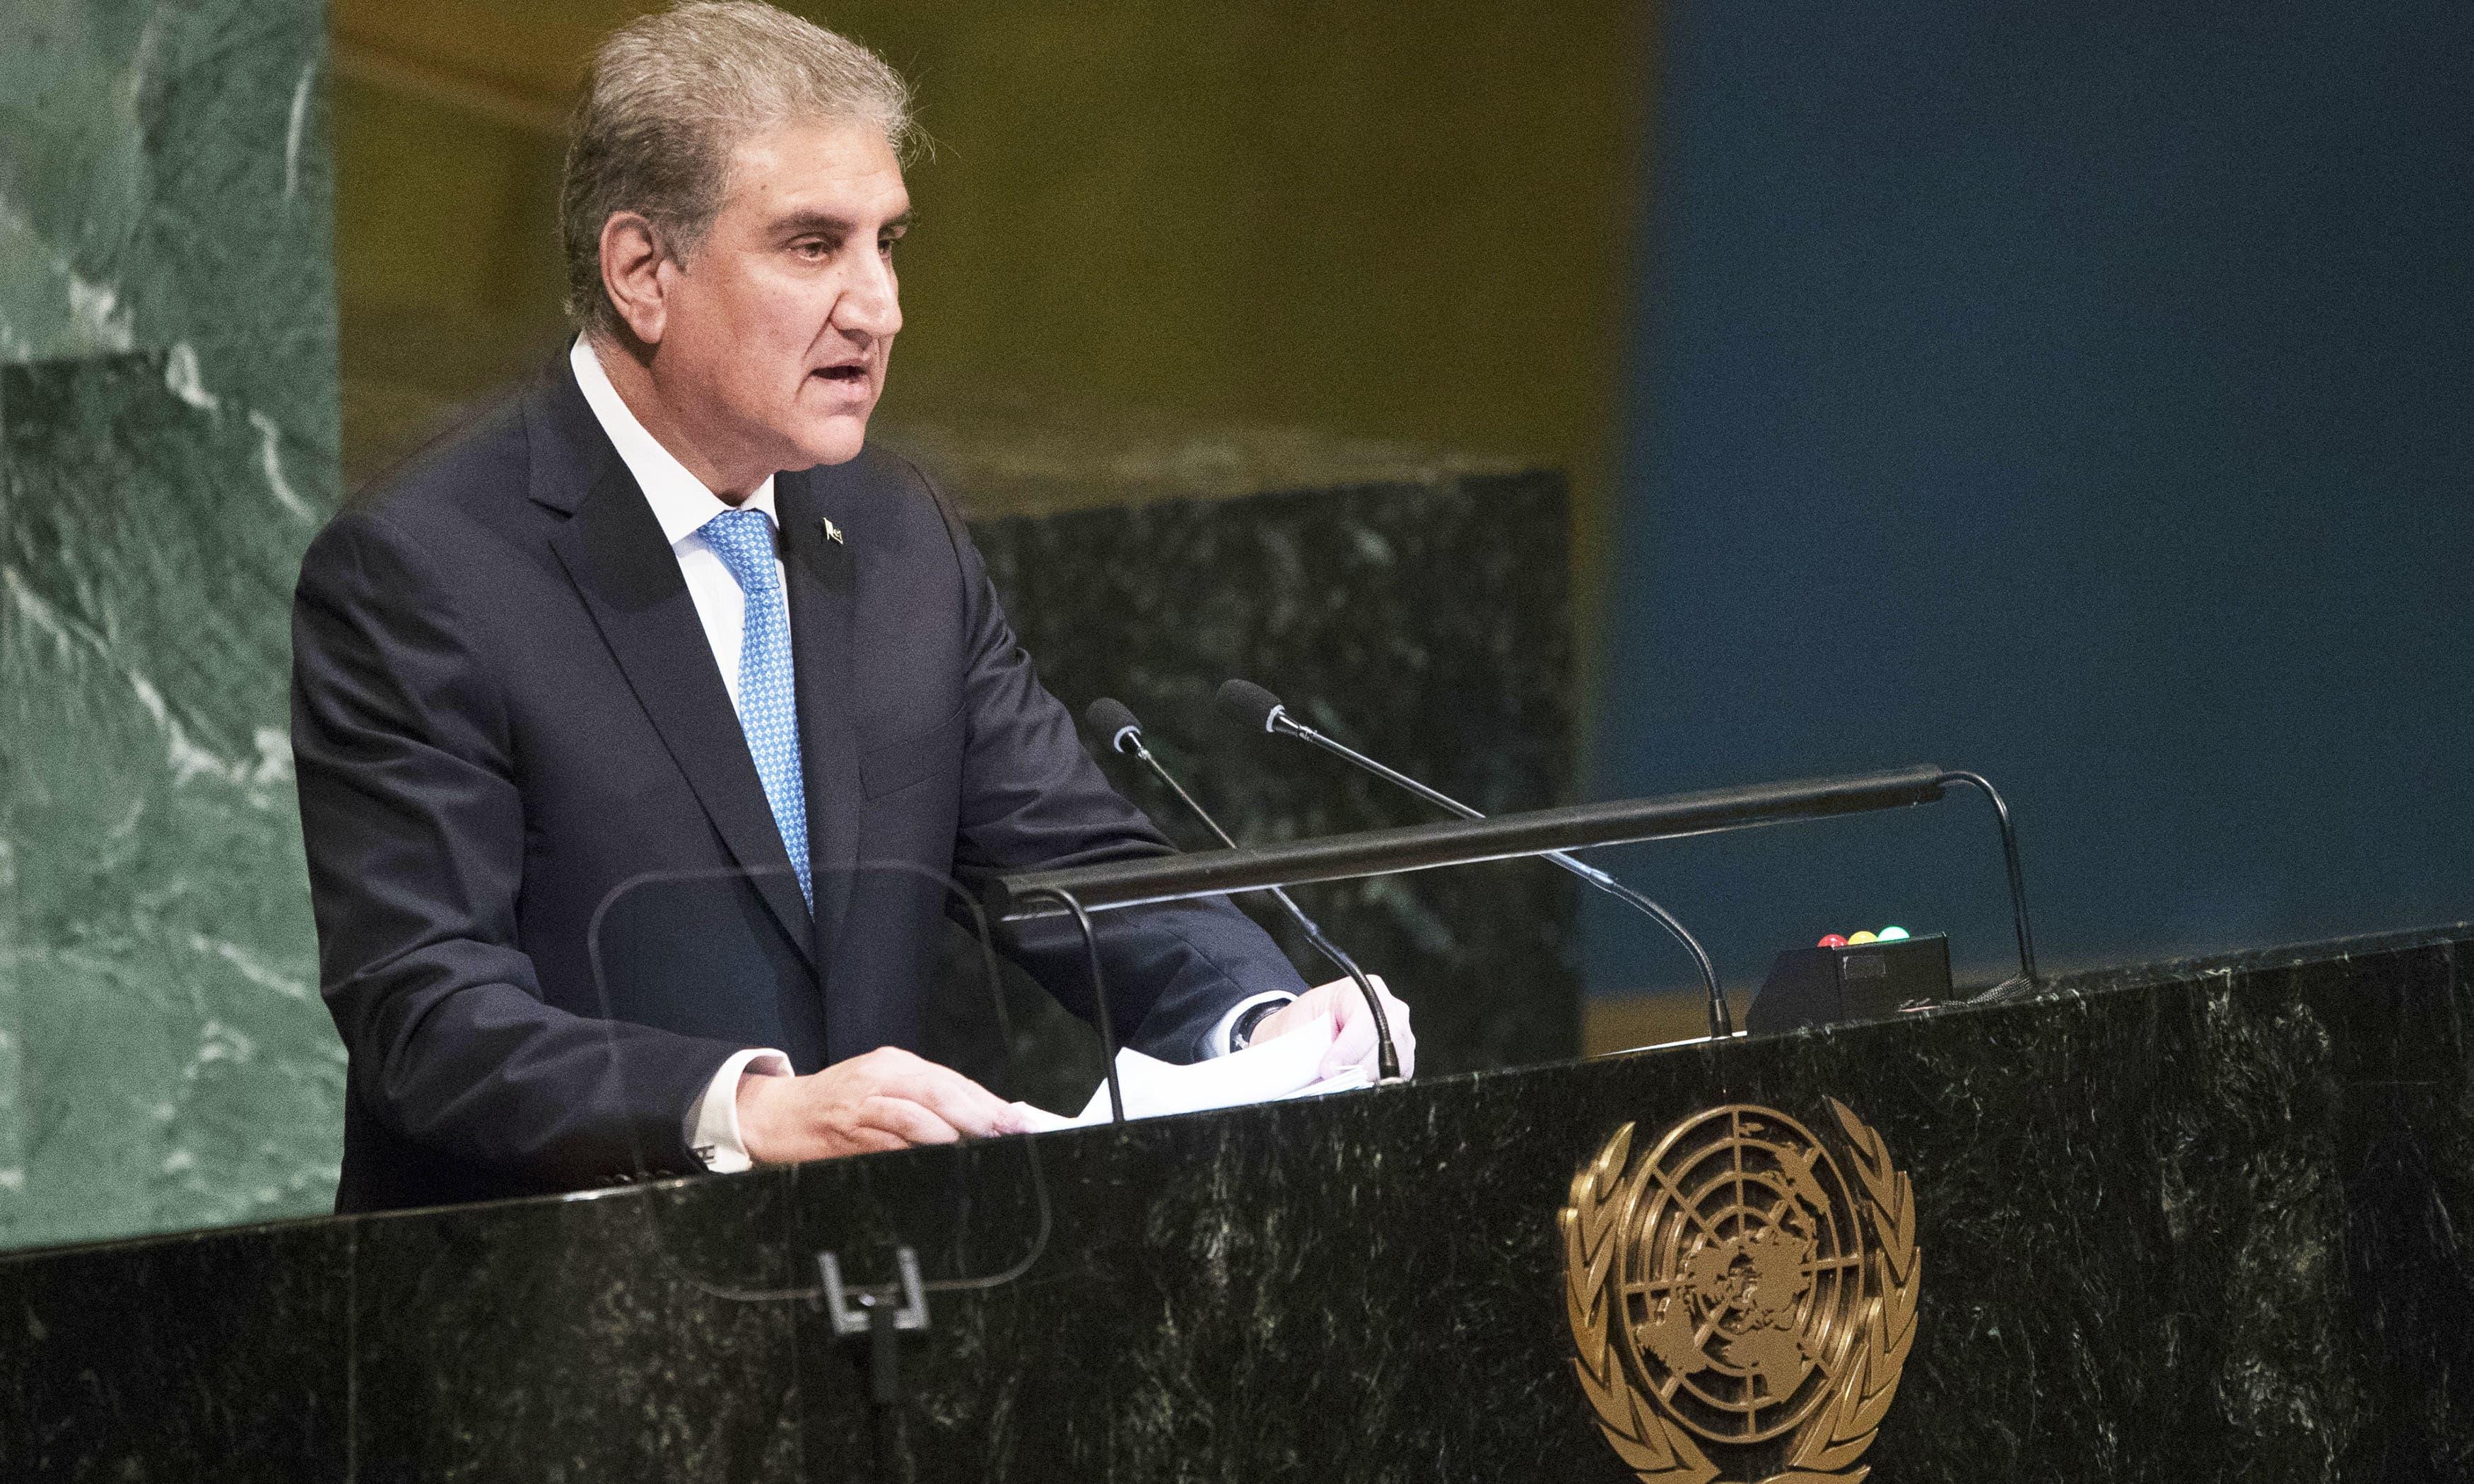 India sponsors terrorism in Pakistan, avoids peace talks on flimsy grounds: FM Qureshi tells UNGA